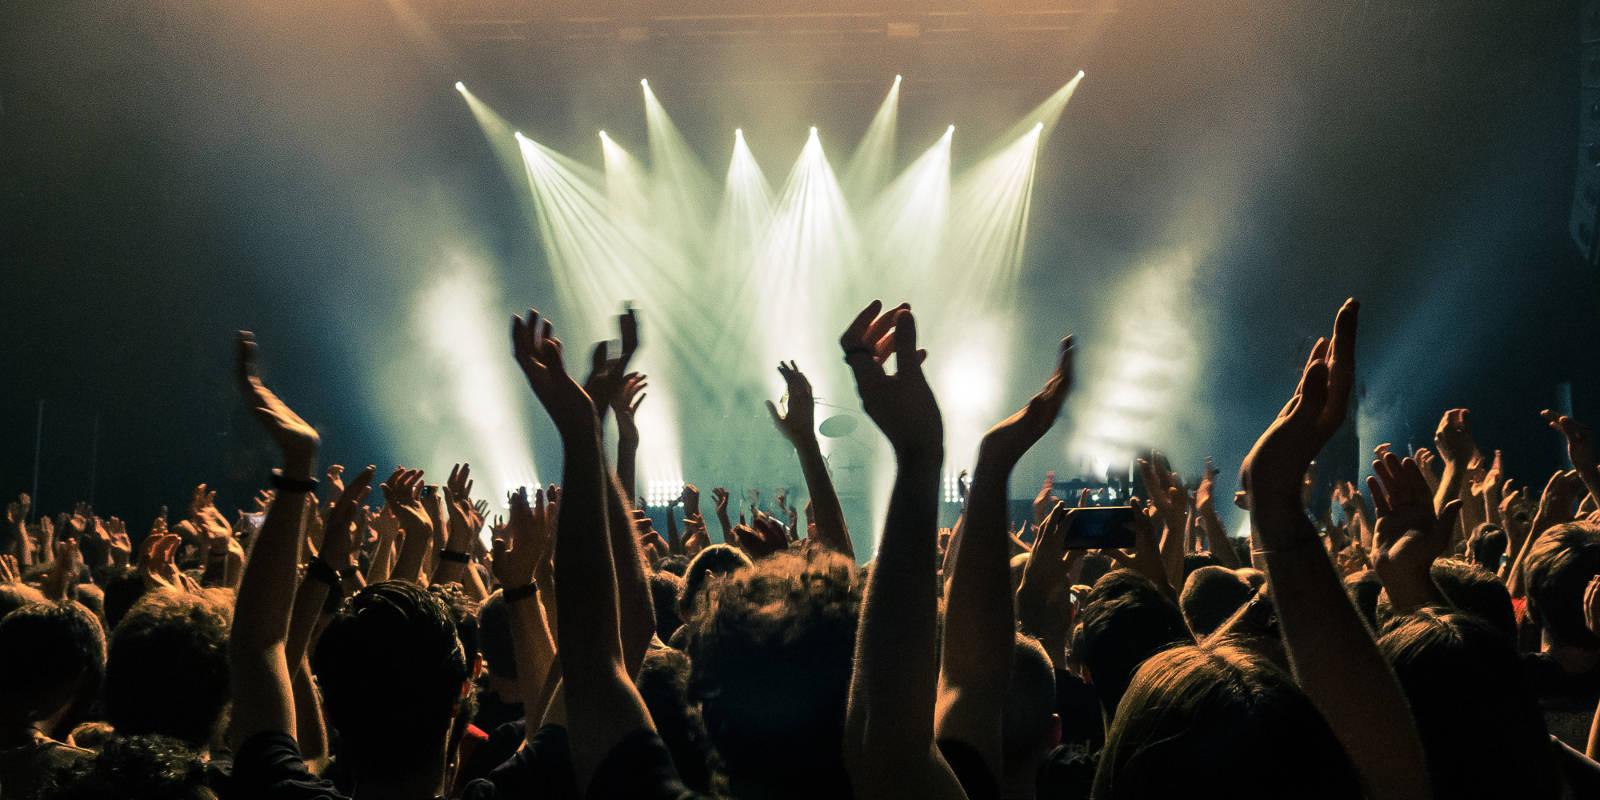 Concert And Live Music Venues  Edinburgh Tourist-8954